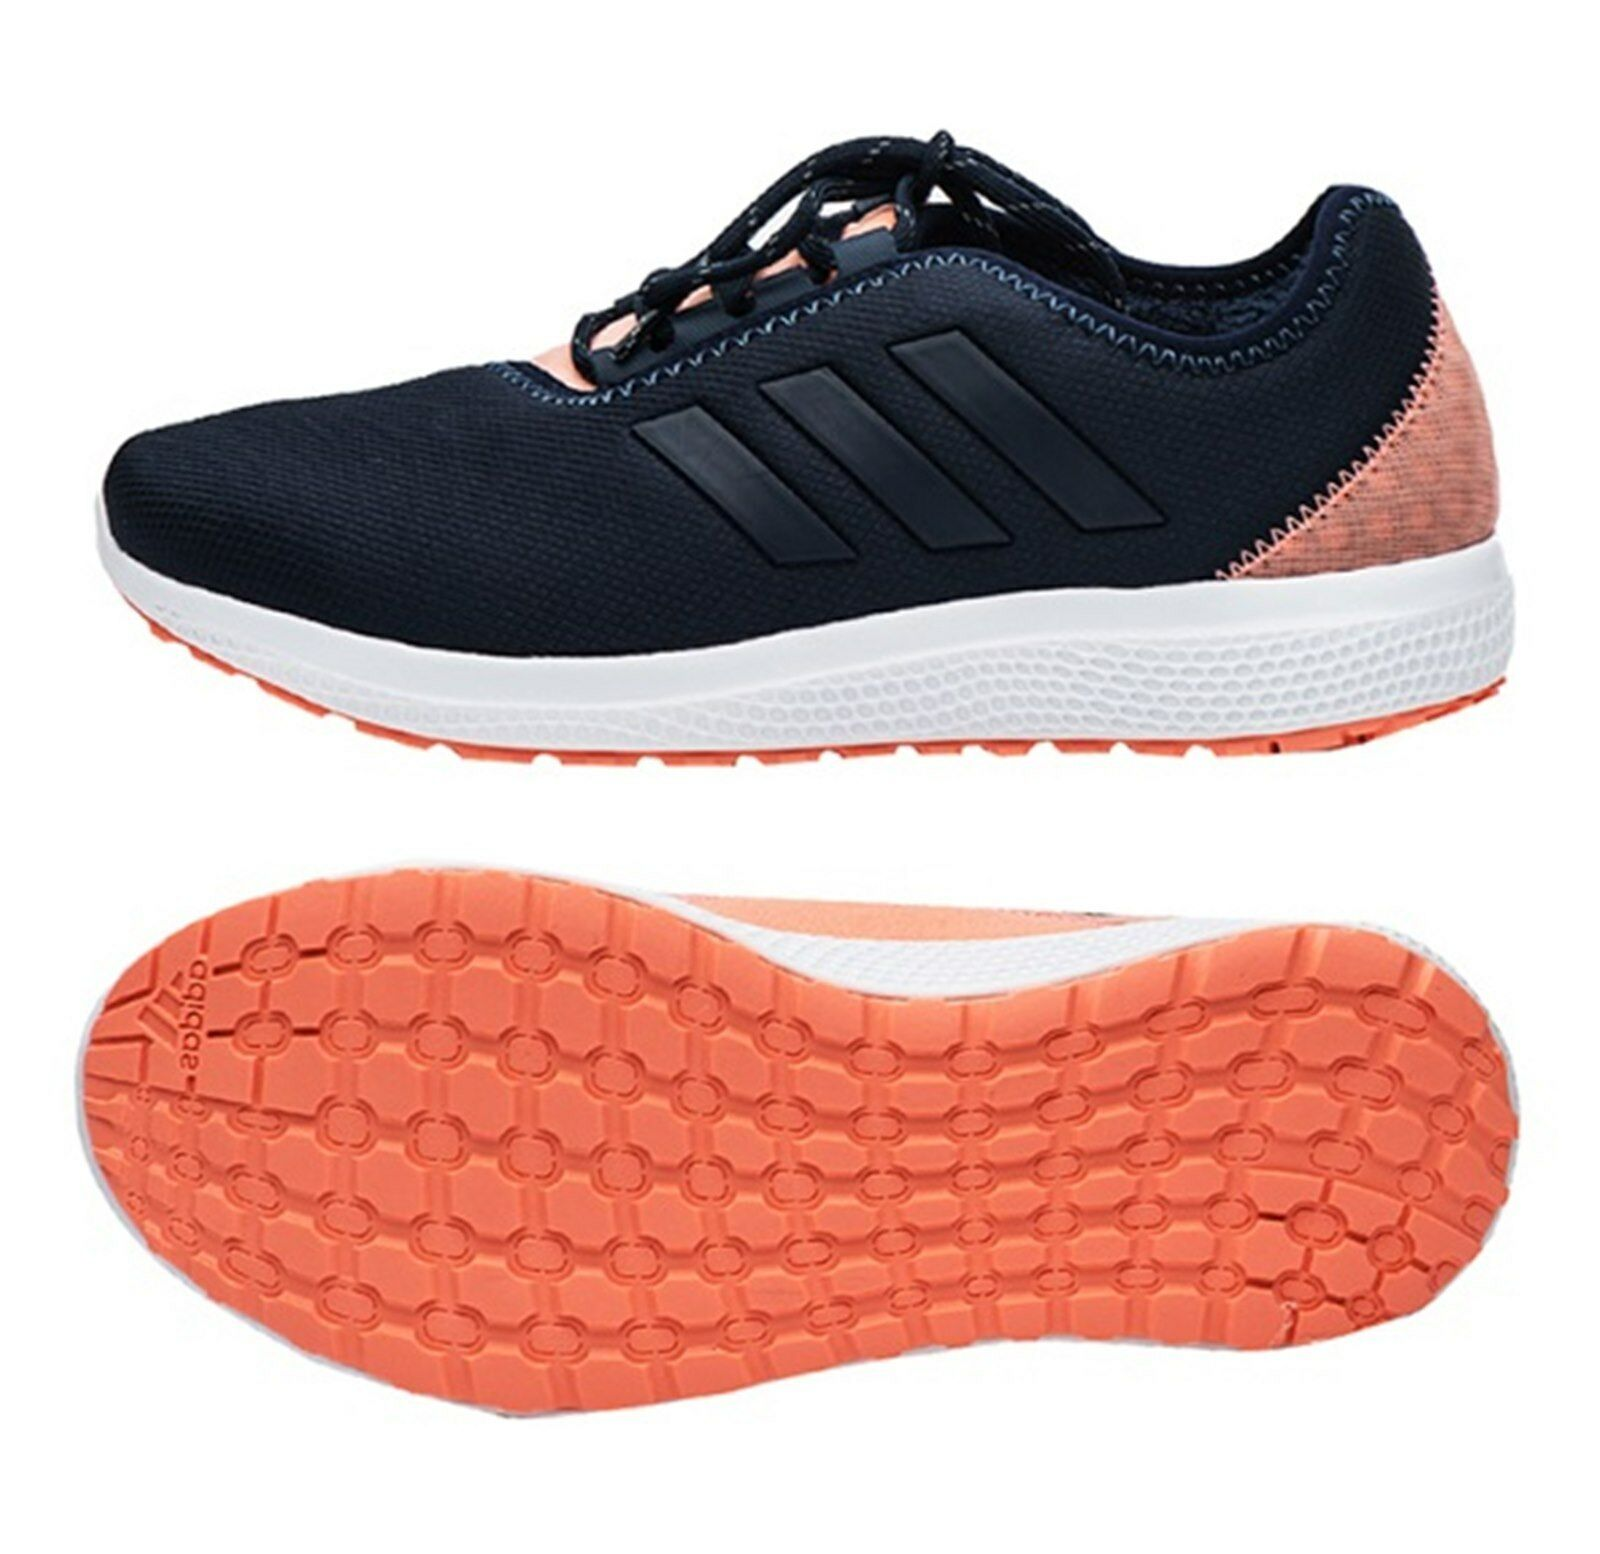 Zapatos De Entrenamiento Adidas Mujer ClimaWarm oscilallate Azul Marino Zapatillas Correr AQ3294